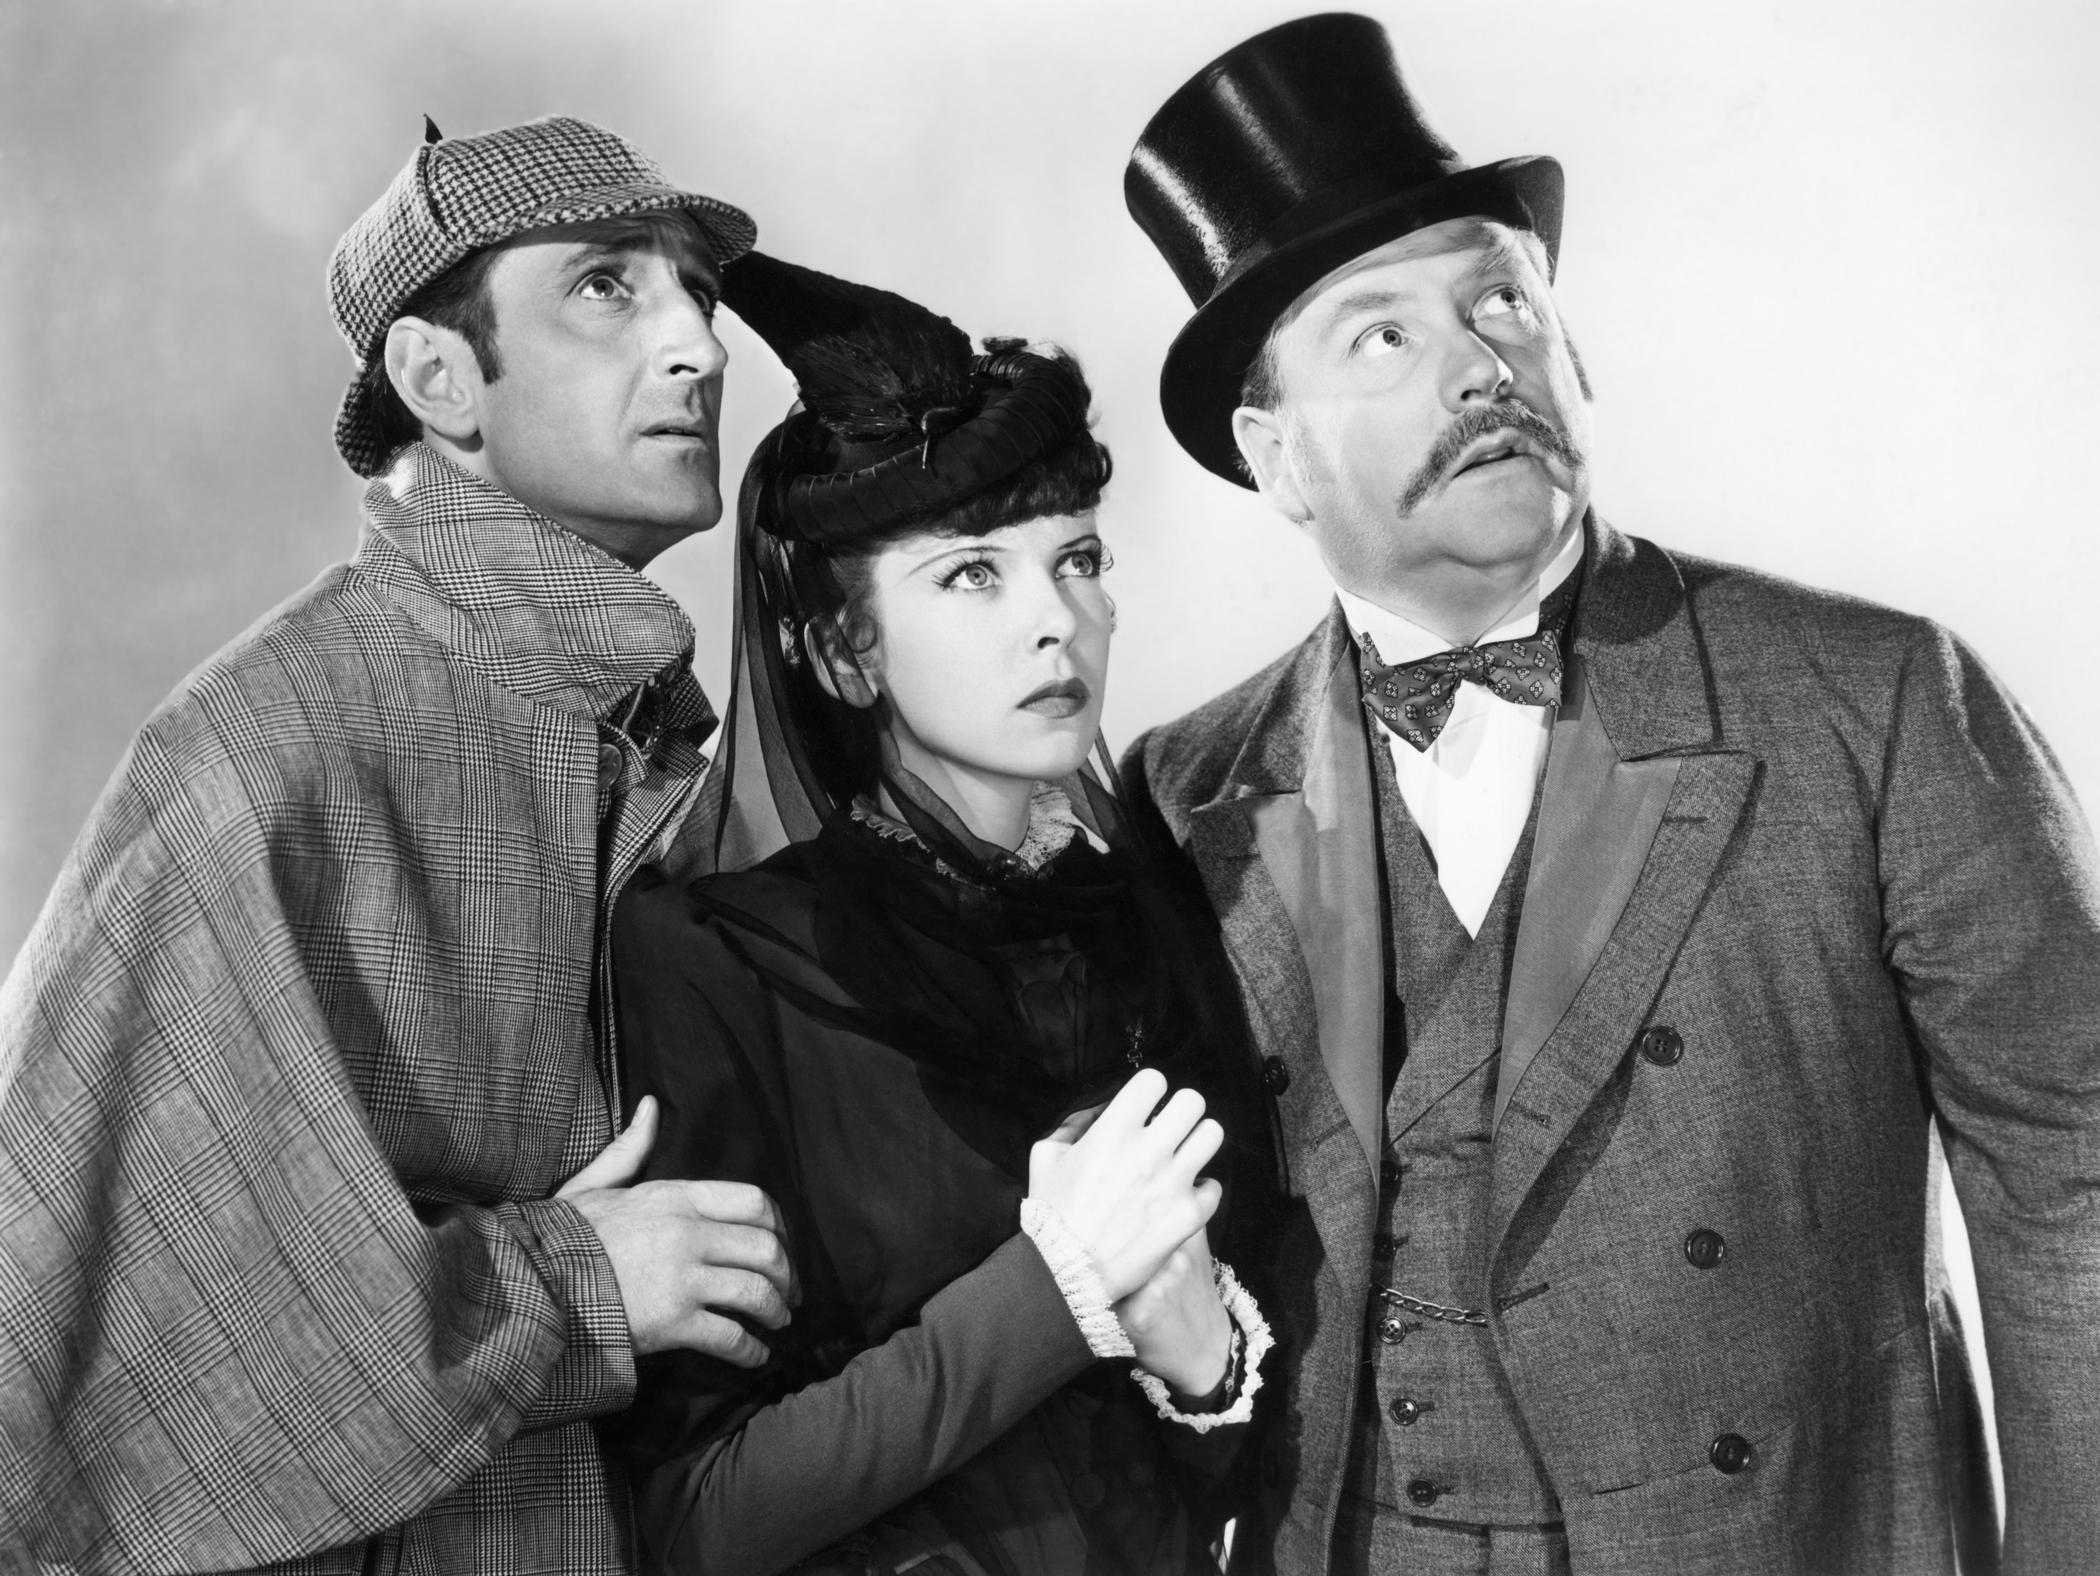 Basil Rathbone, Nigel Bruce, and Ida Lupino in The Adventures of Sherlock Holmes (1939)